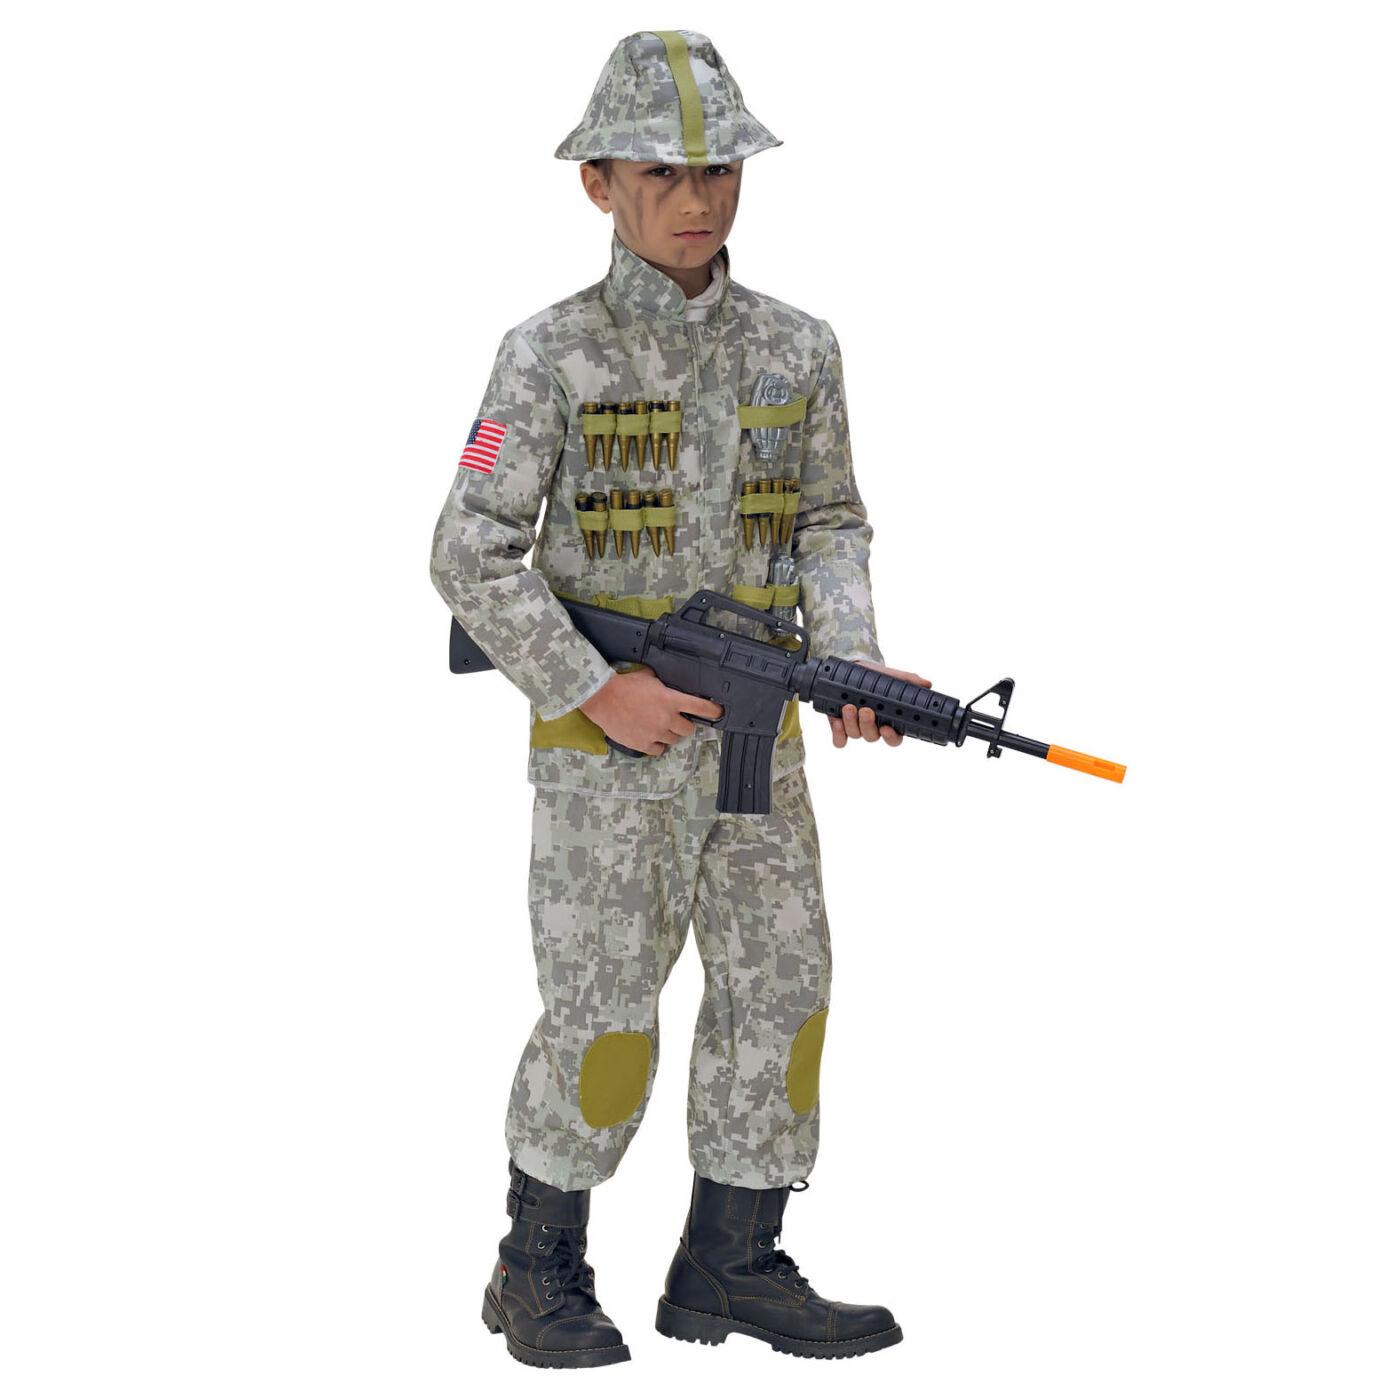 Amerikai katona jelmez 140-es